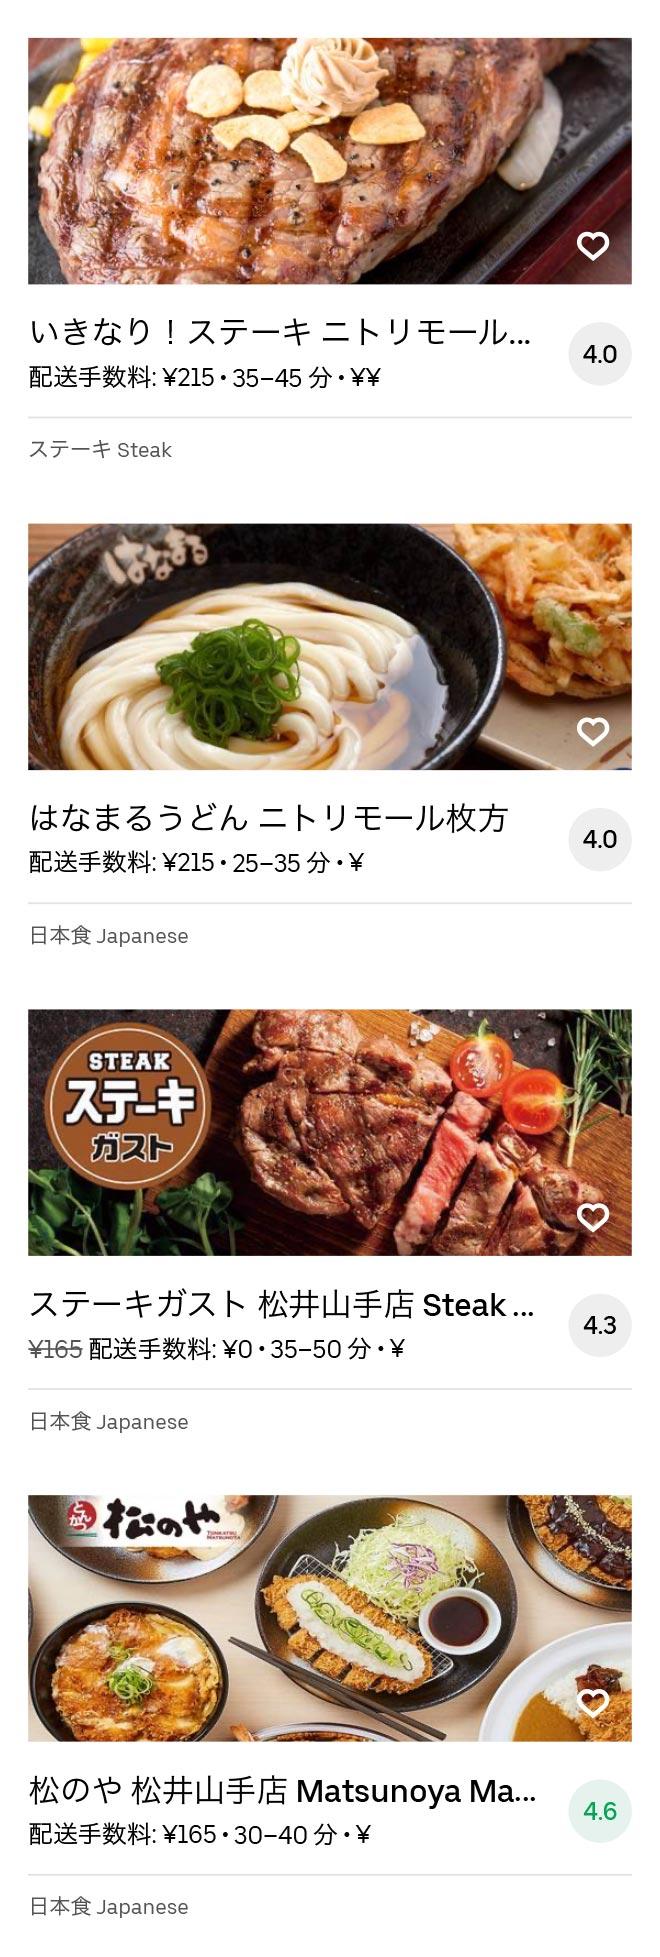 Nagao menu 2010 04